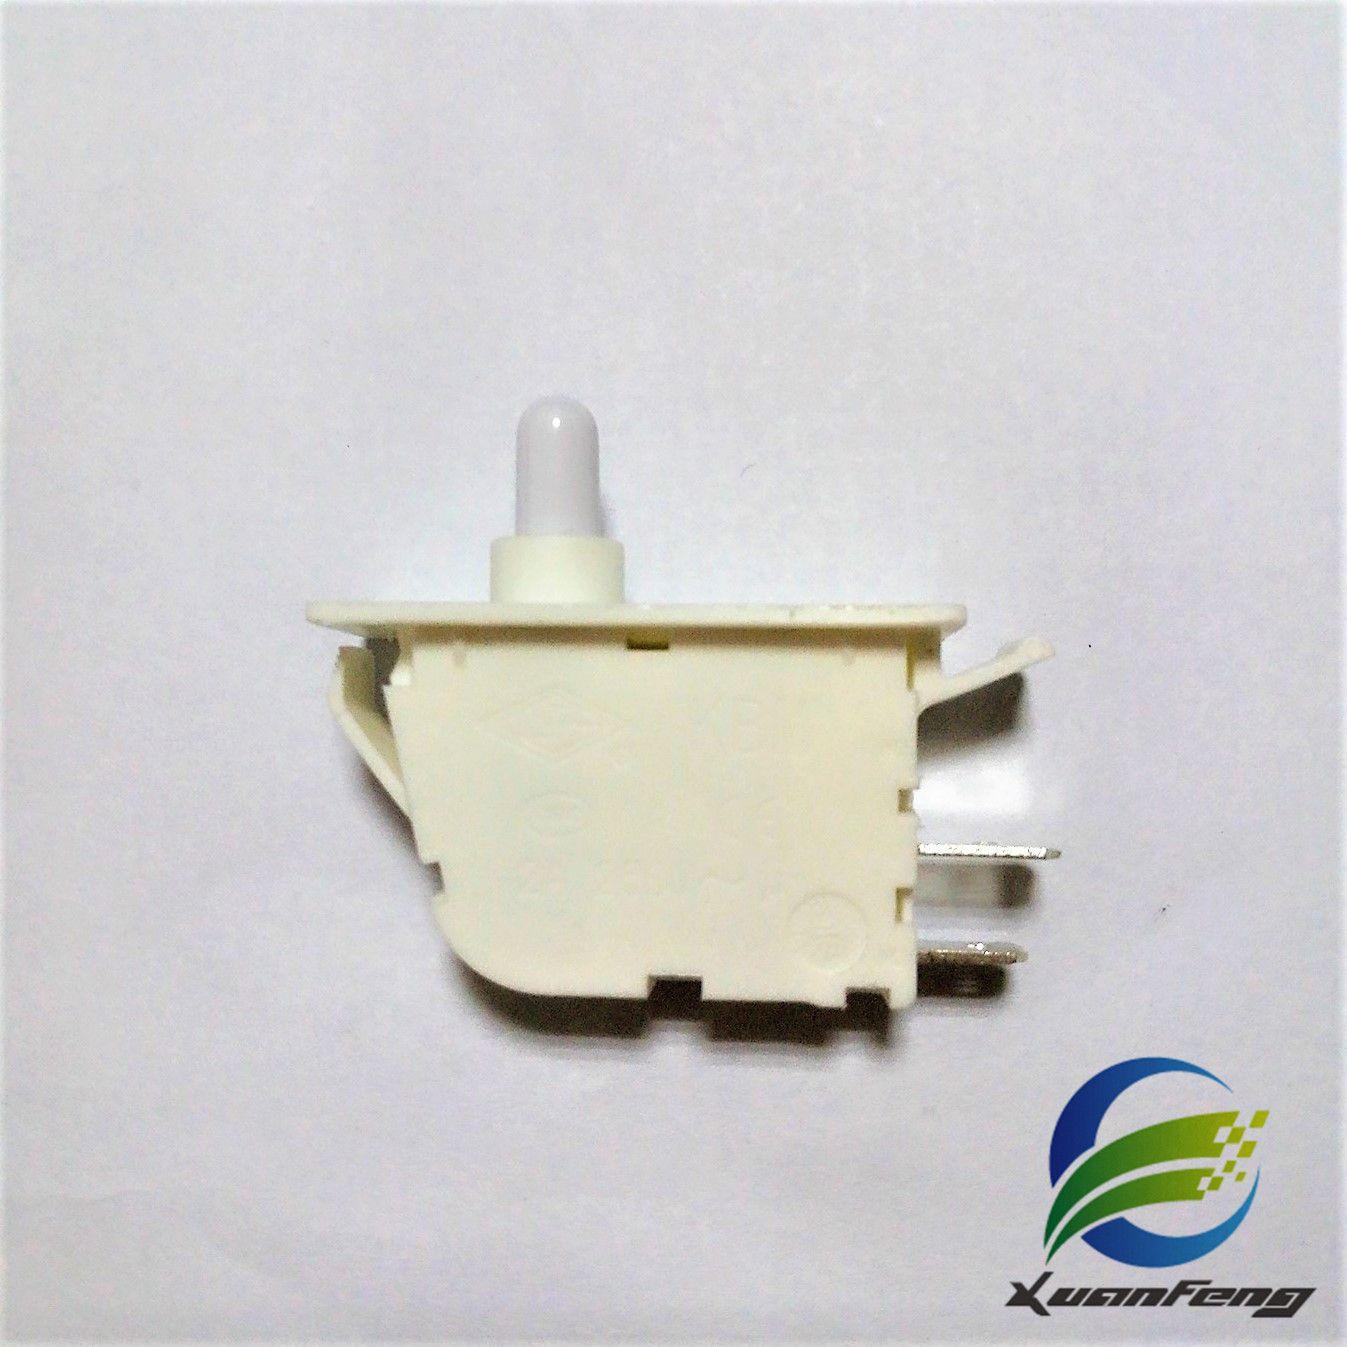 ... IP40 2A 250V AC white Fan shaped refrigerator cabinet door switch Free ship ... & IP40 2A 250V AC white Fan shaped refrigerator cabinet door switch ...